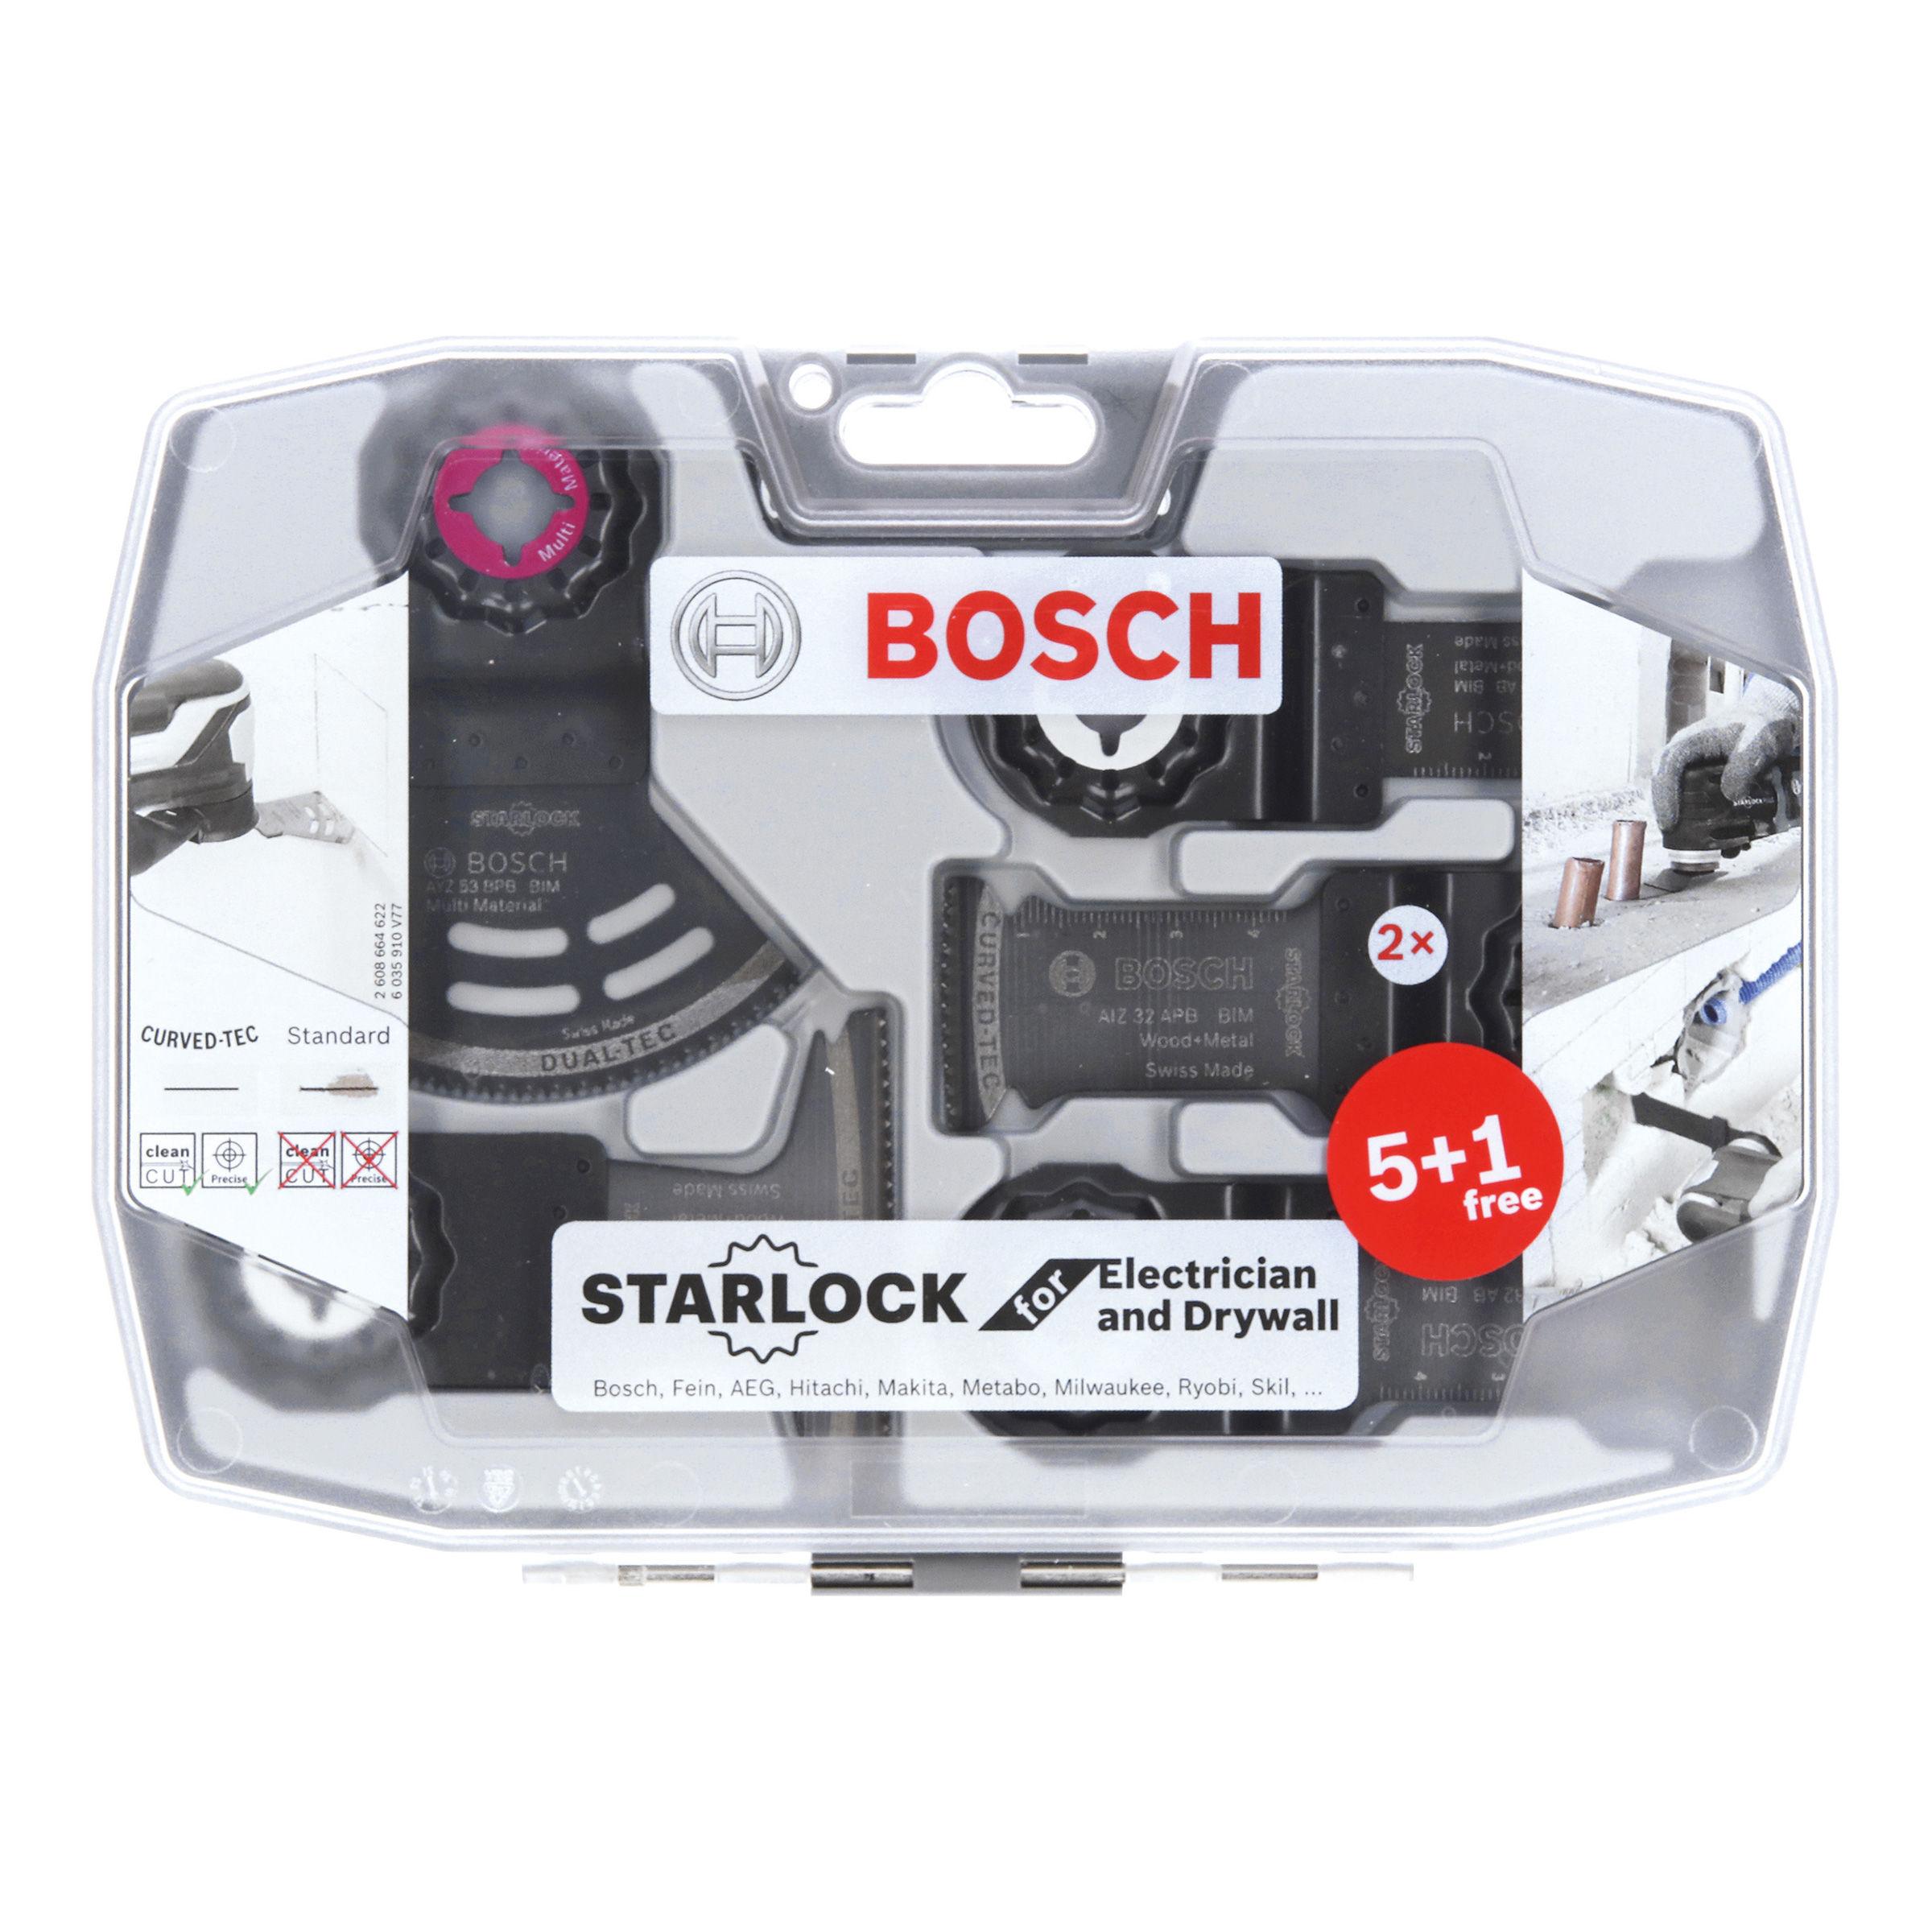 Bosch 2608664622 Starlock Electrician & Drywall Multi-Tool Blade Set (6  Piece)